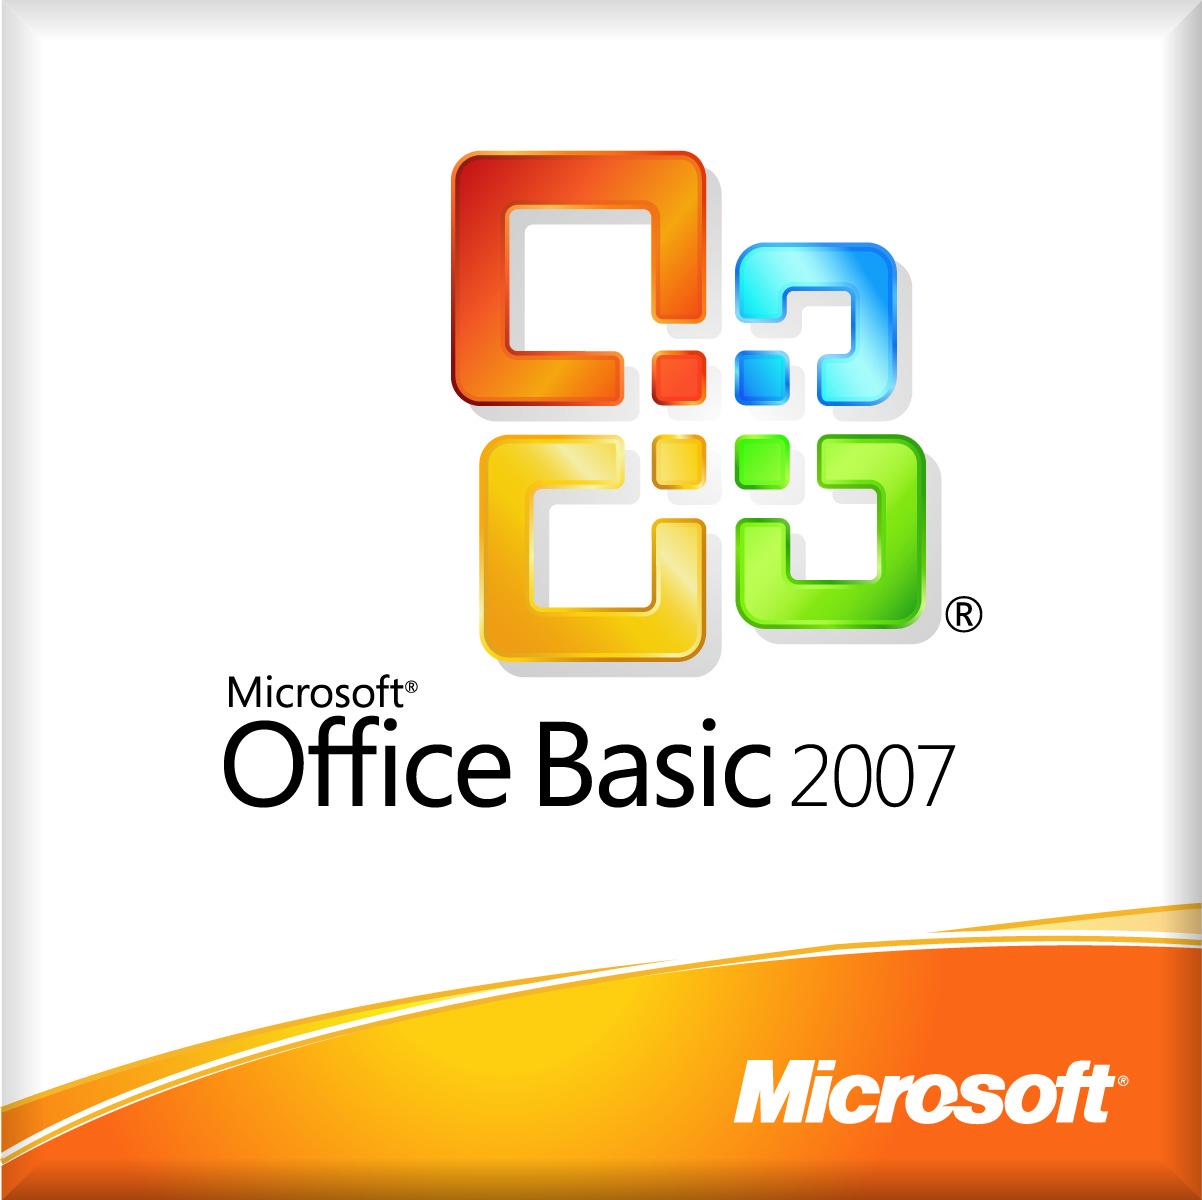 Microsoft Office 2007 OPK Master Kit w/SP1 - Media - OEM - CD - Win - English International